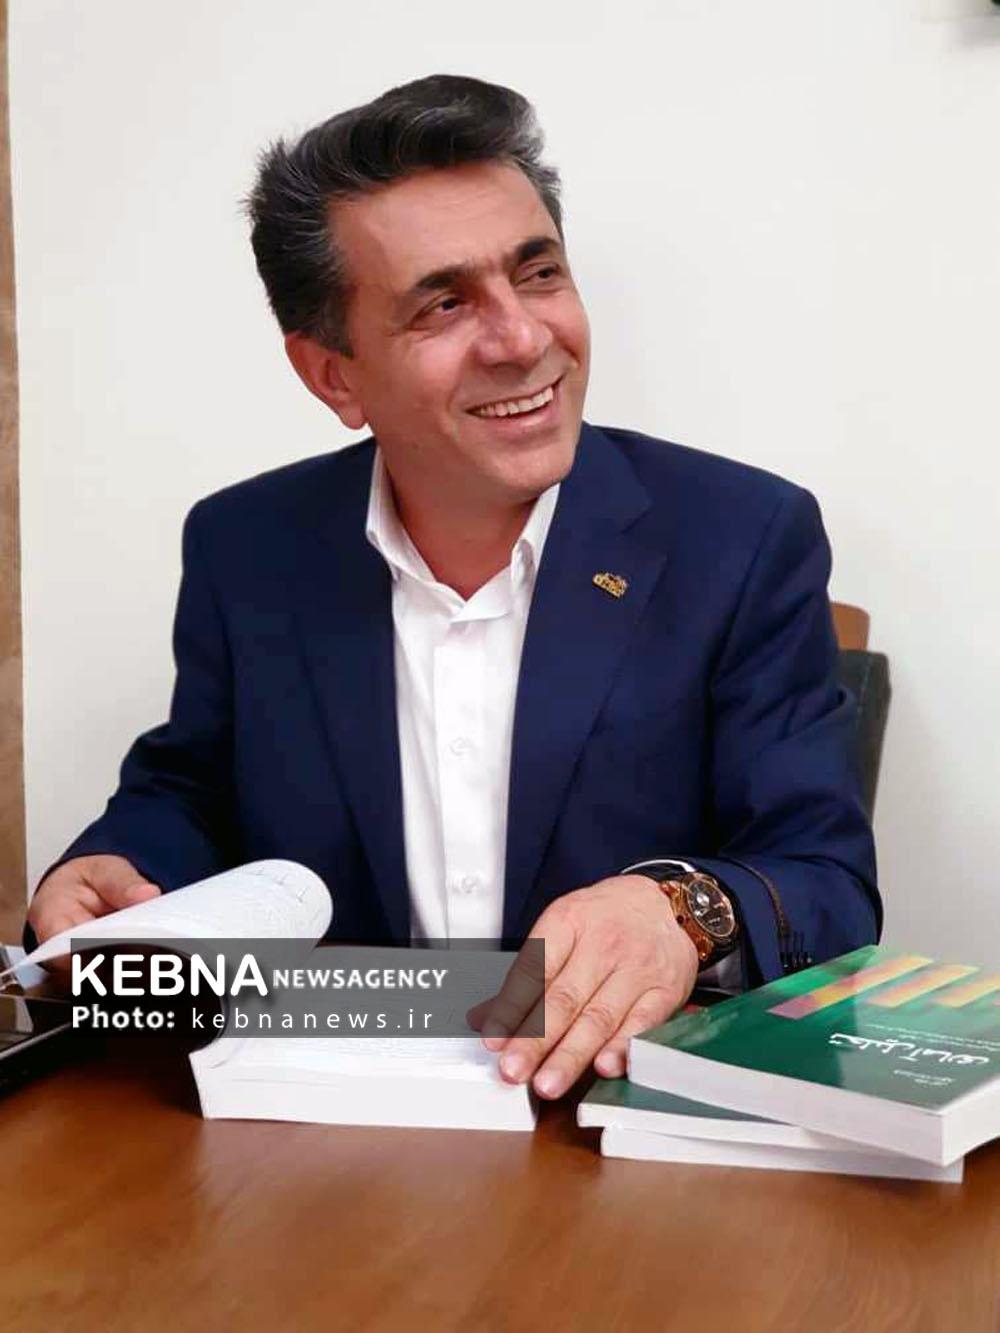 https://www.kebnanews.ir/images/docs/files/000410/nf00410557-1.jpg